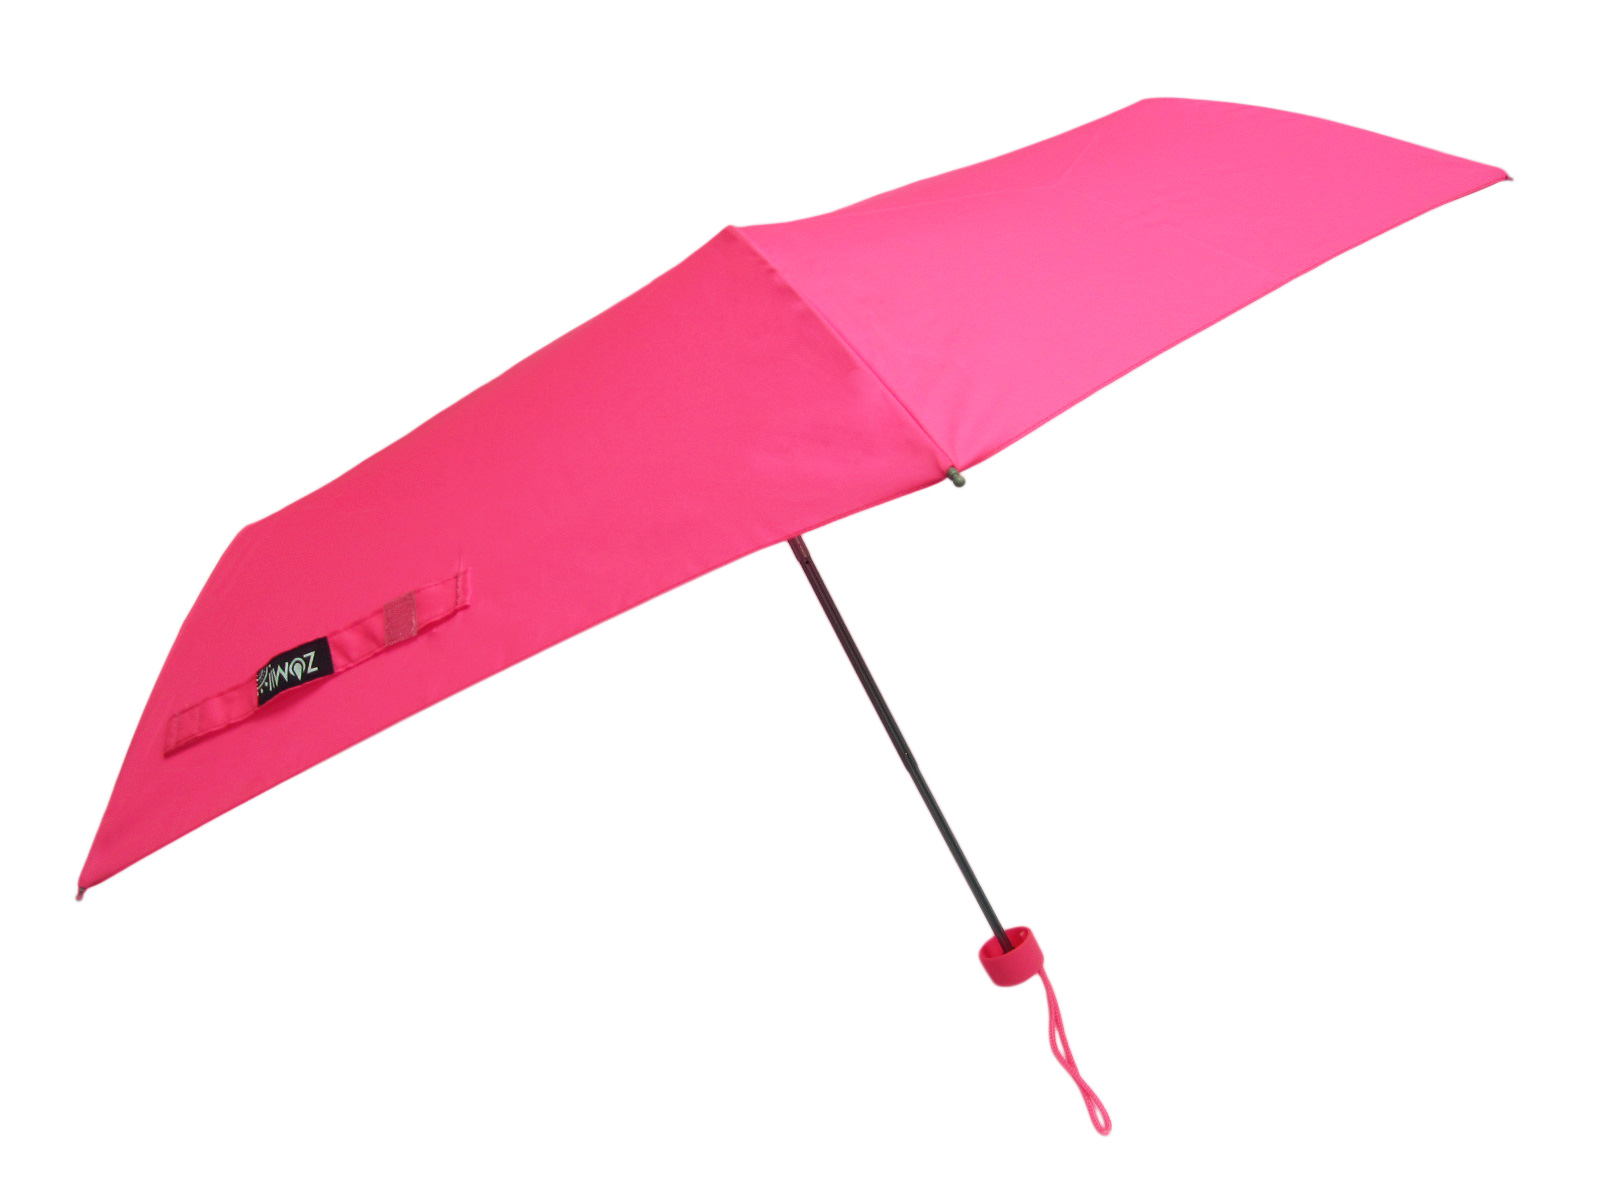 Red Coral Super Light Umbrella (2016)